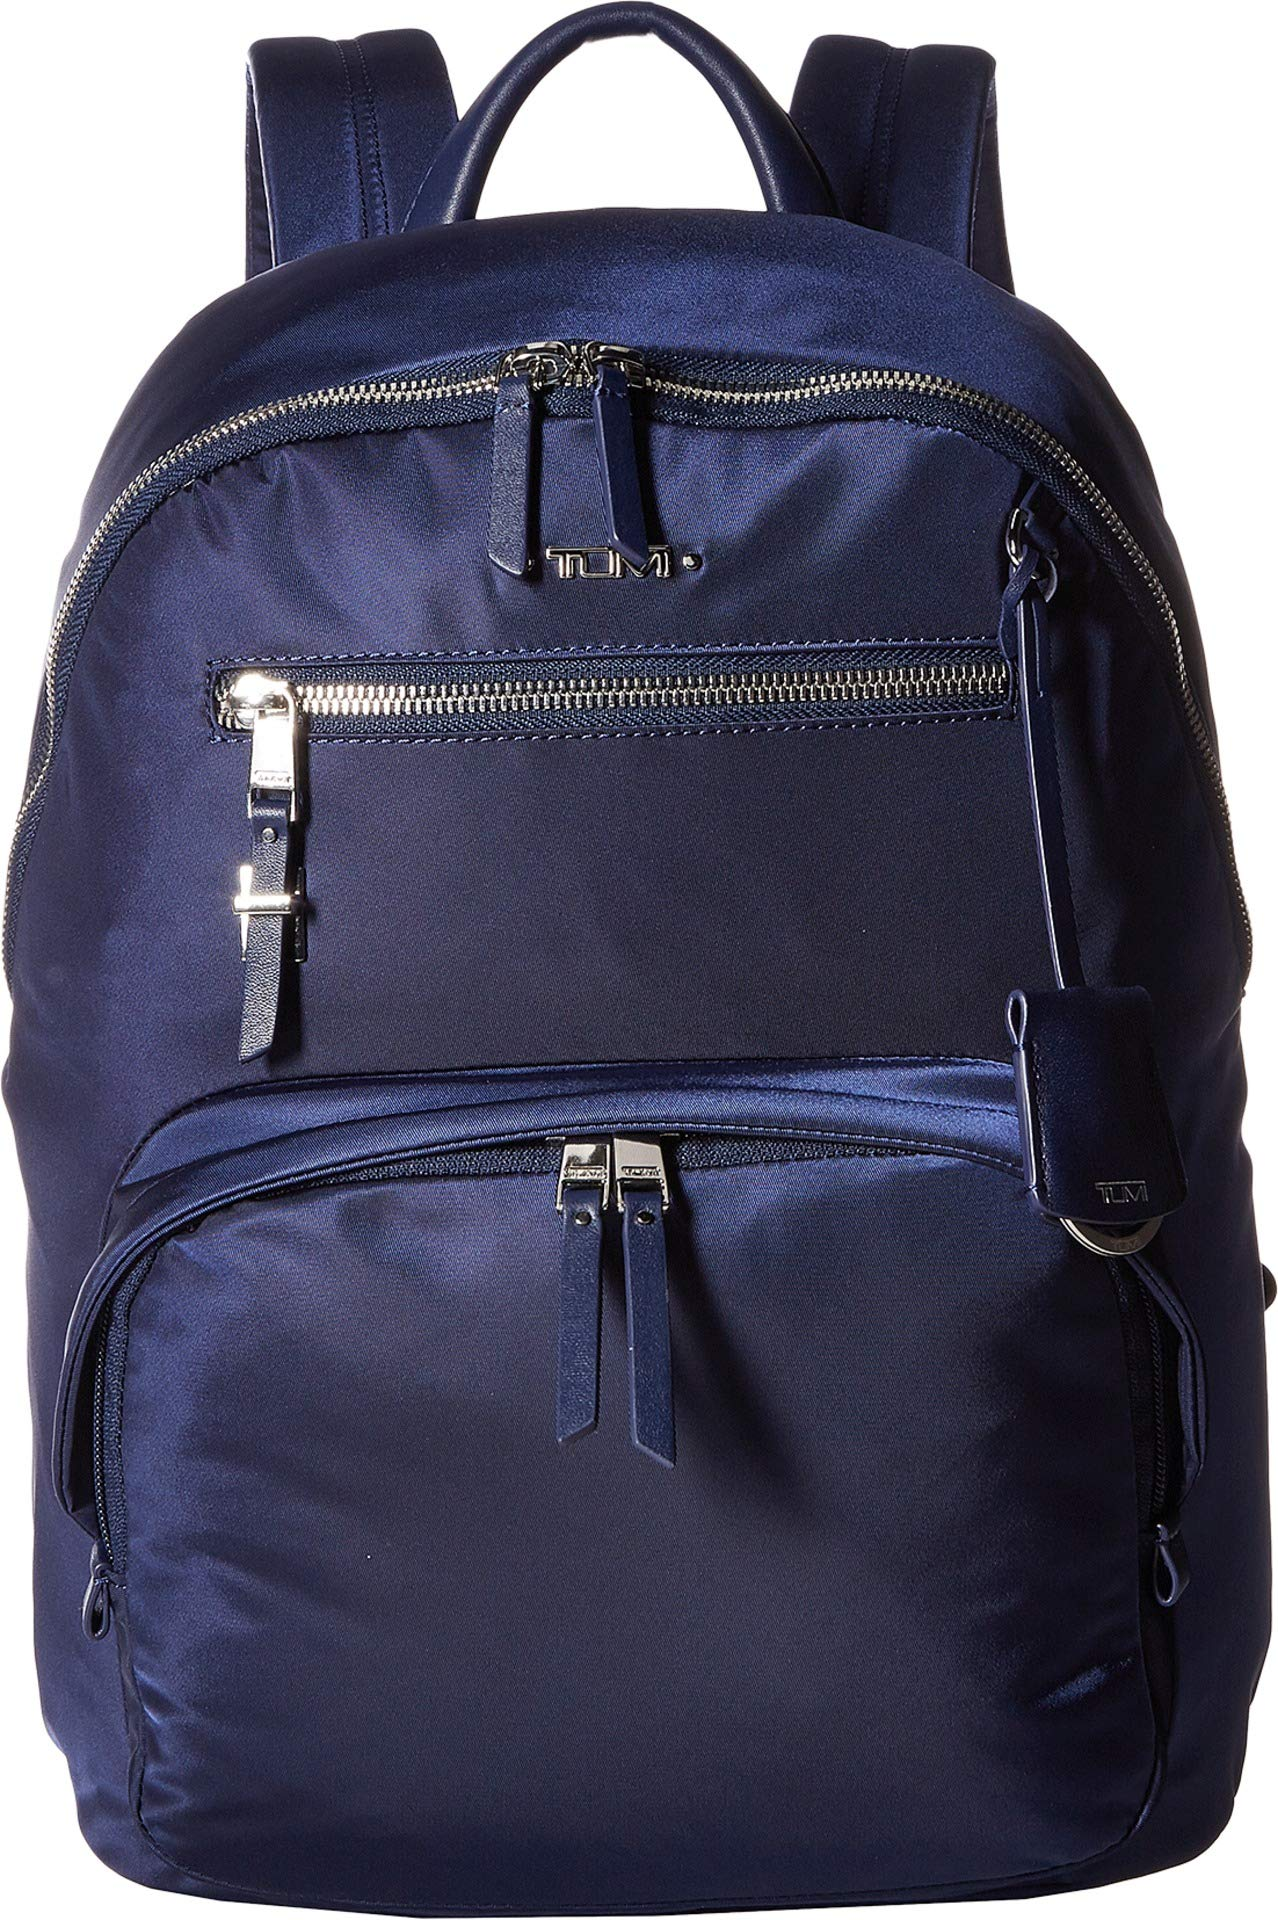 Tumi Women's Voyageur Hagen Backpack, Ultramarine, Blue, One Size